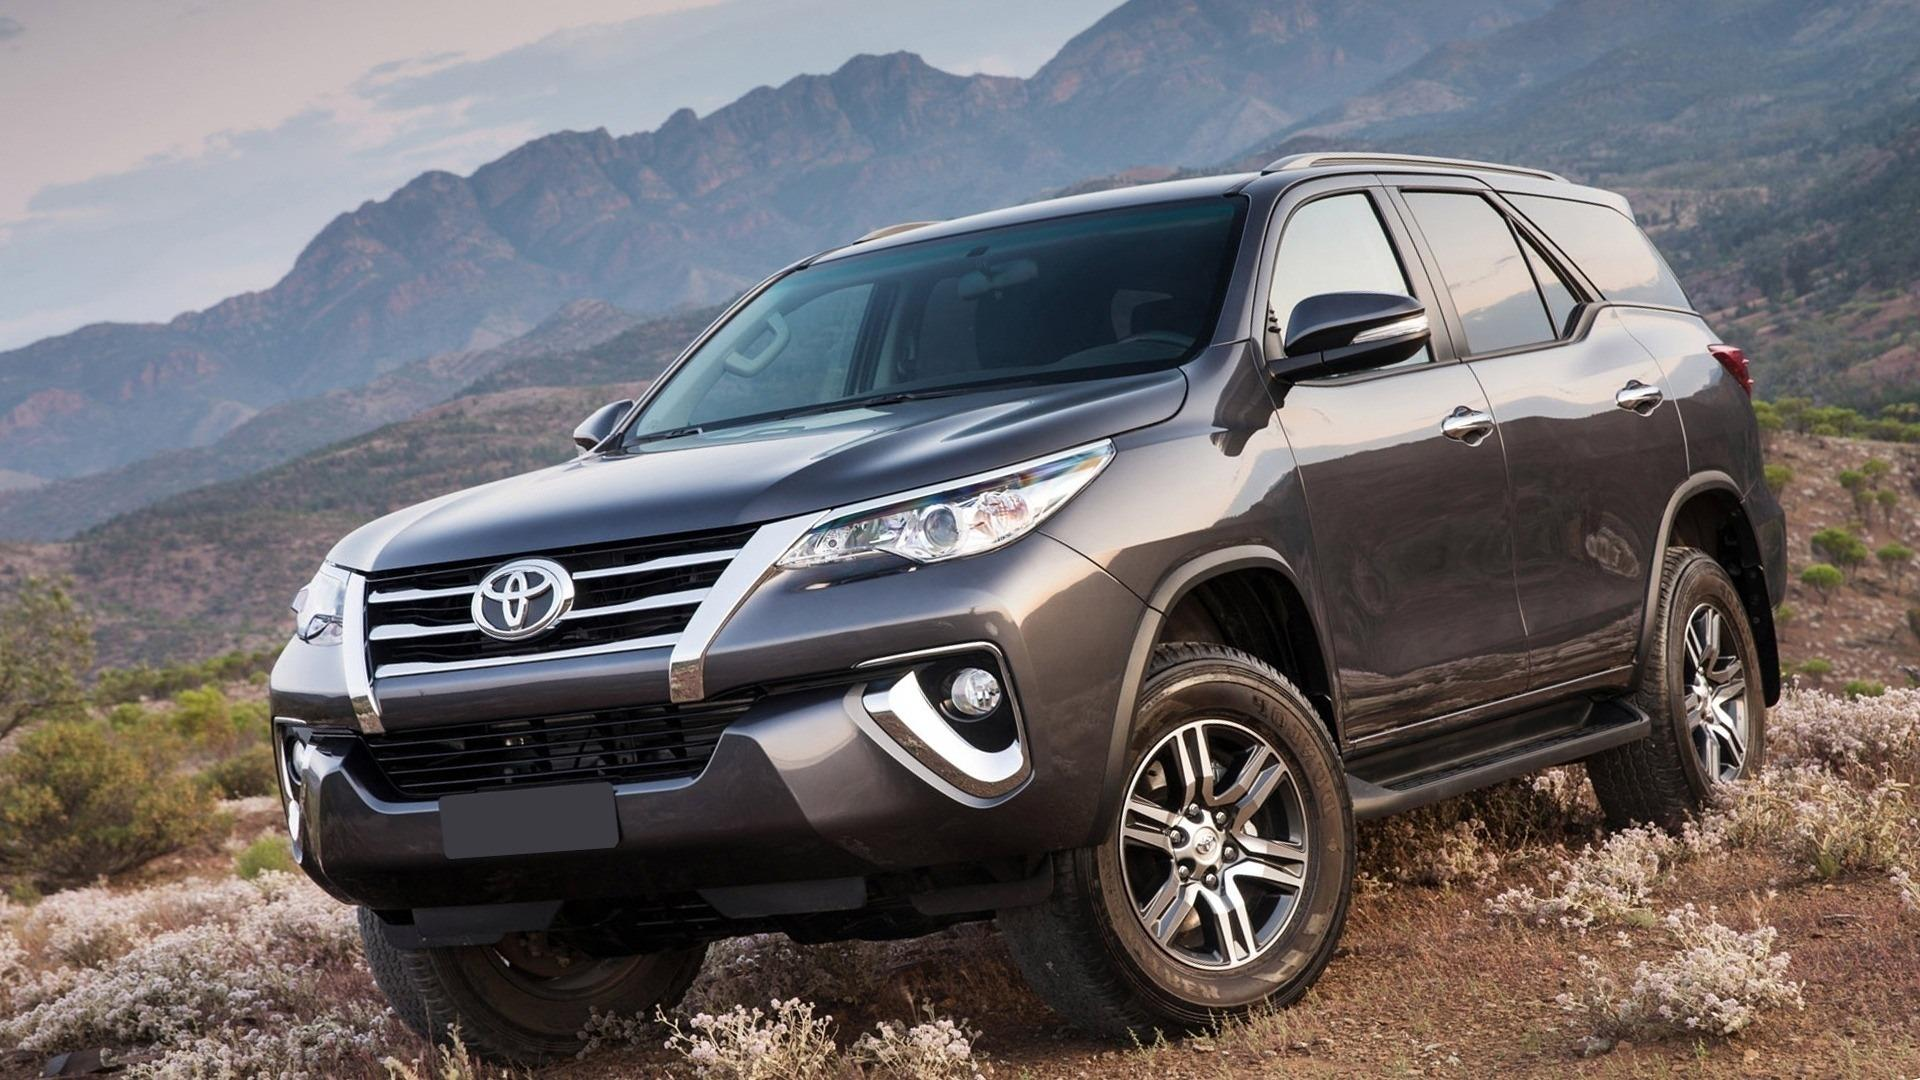 Toyota Fortuner Hd Wallpaper - Toyota Fortuner 2019 Black , HD Wallpaper & Backgrounds